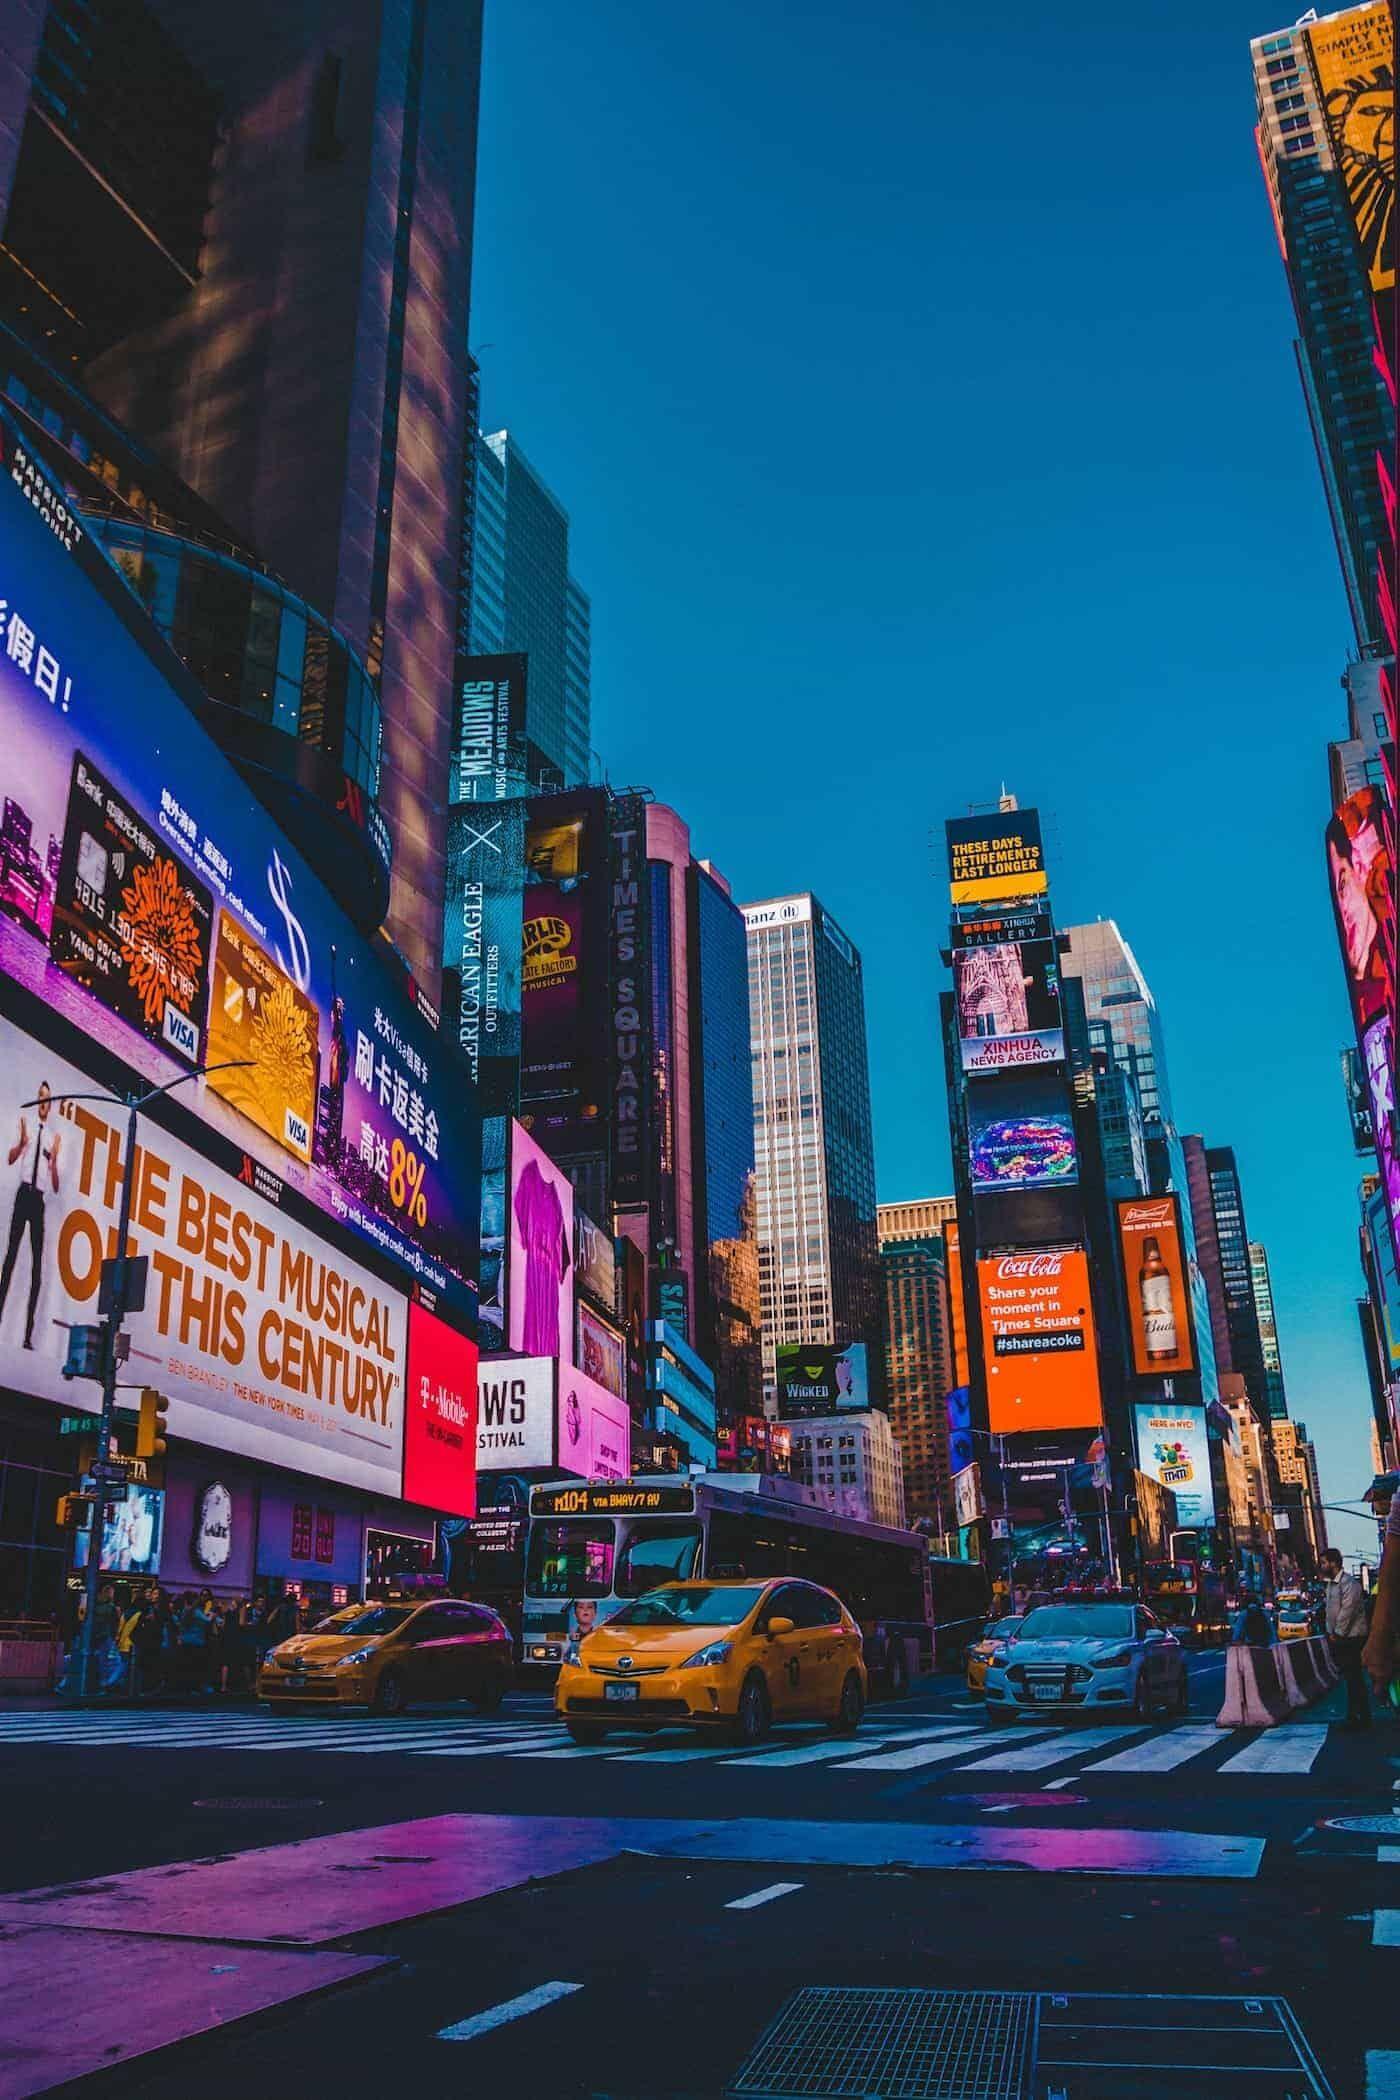 Top 10 Photo Spots In New York City New York Wallpaper New York City Travel City Landscape